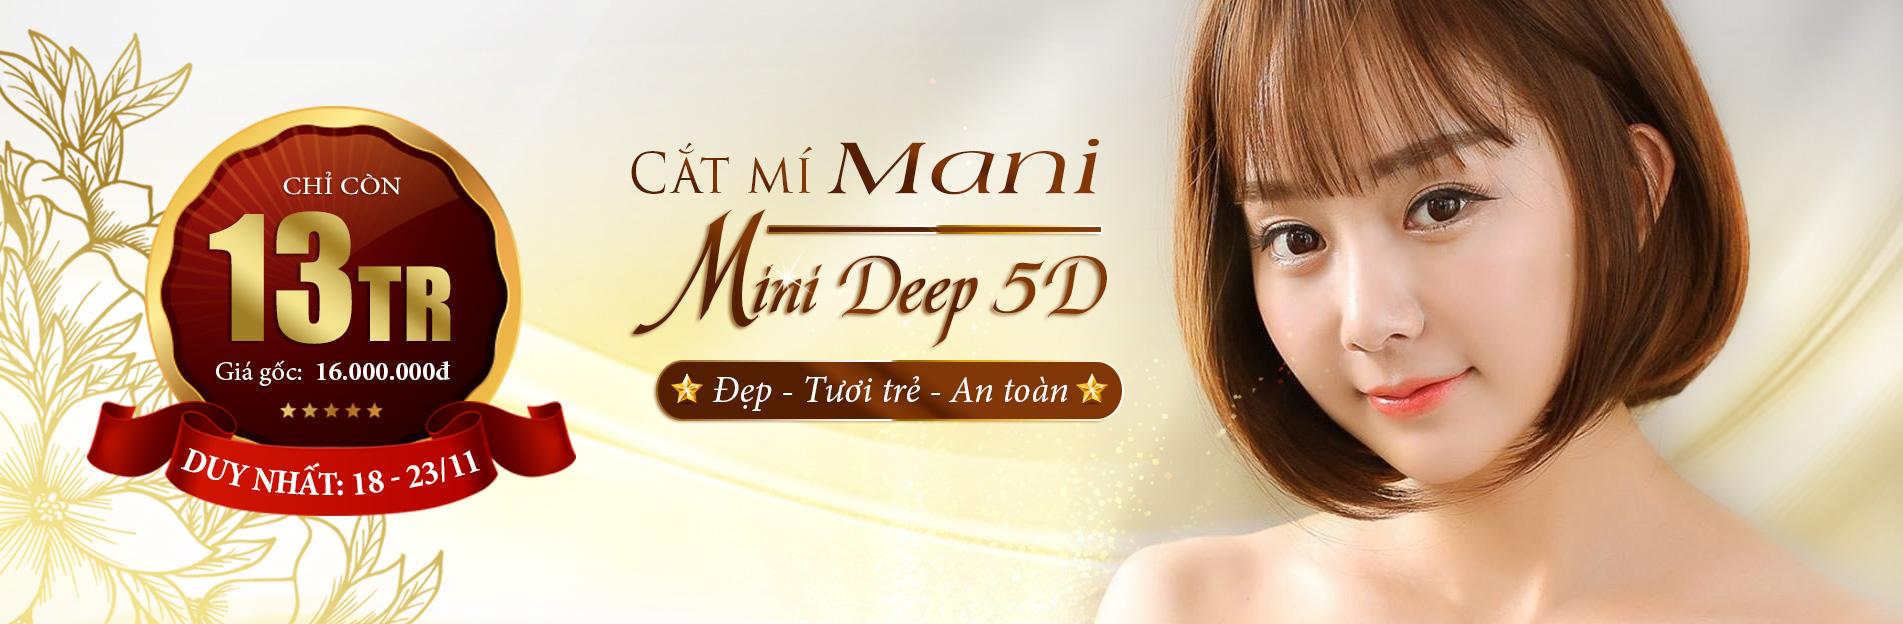 Banner Mani Mini Deep 5d